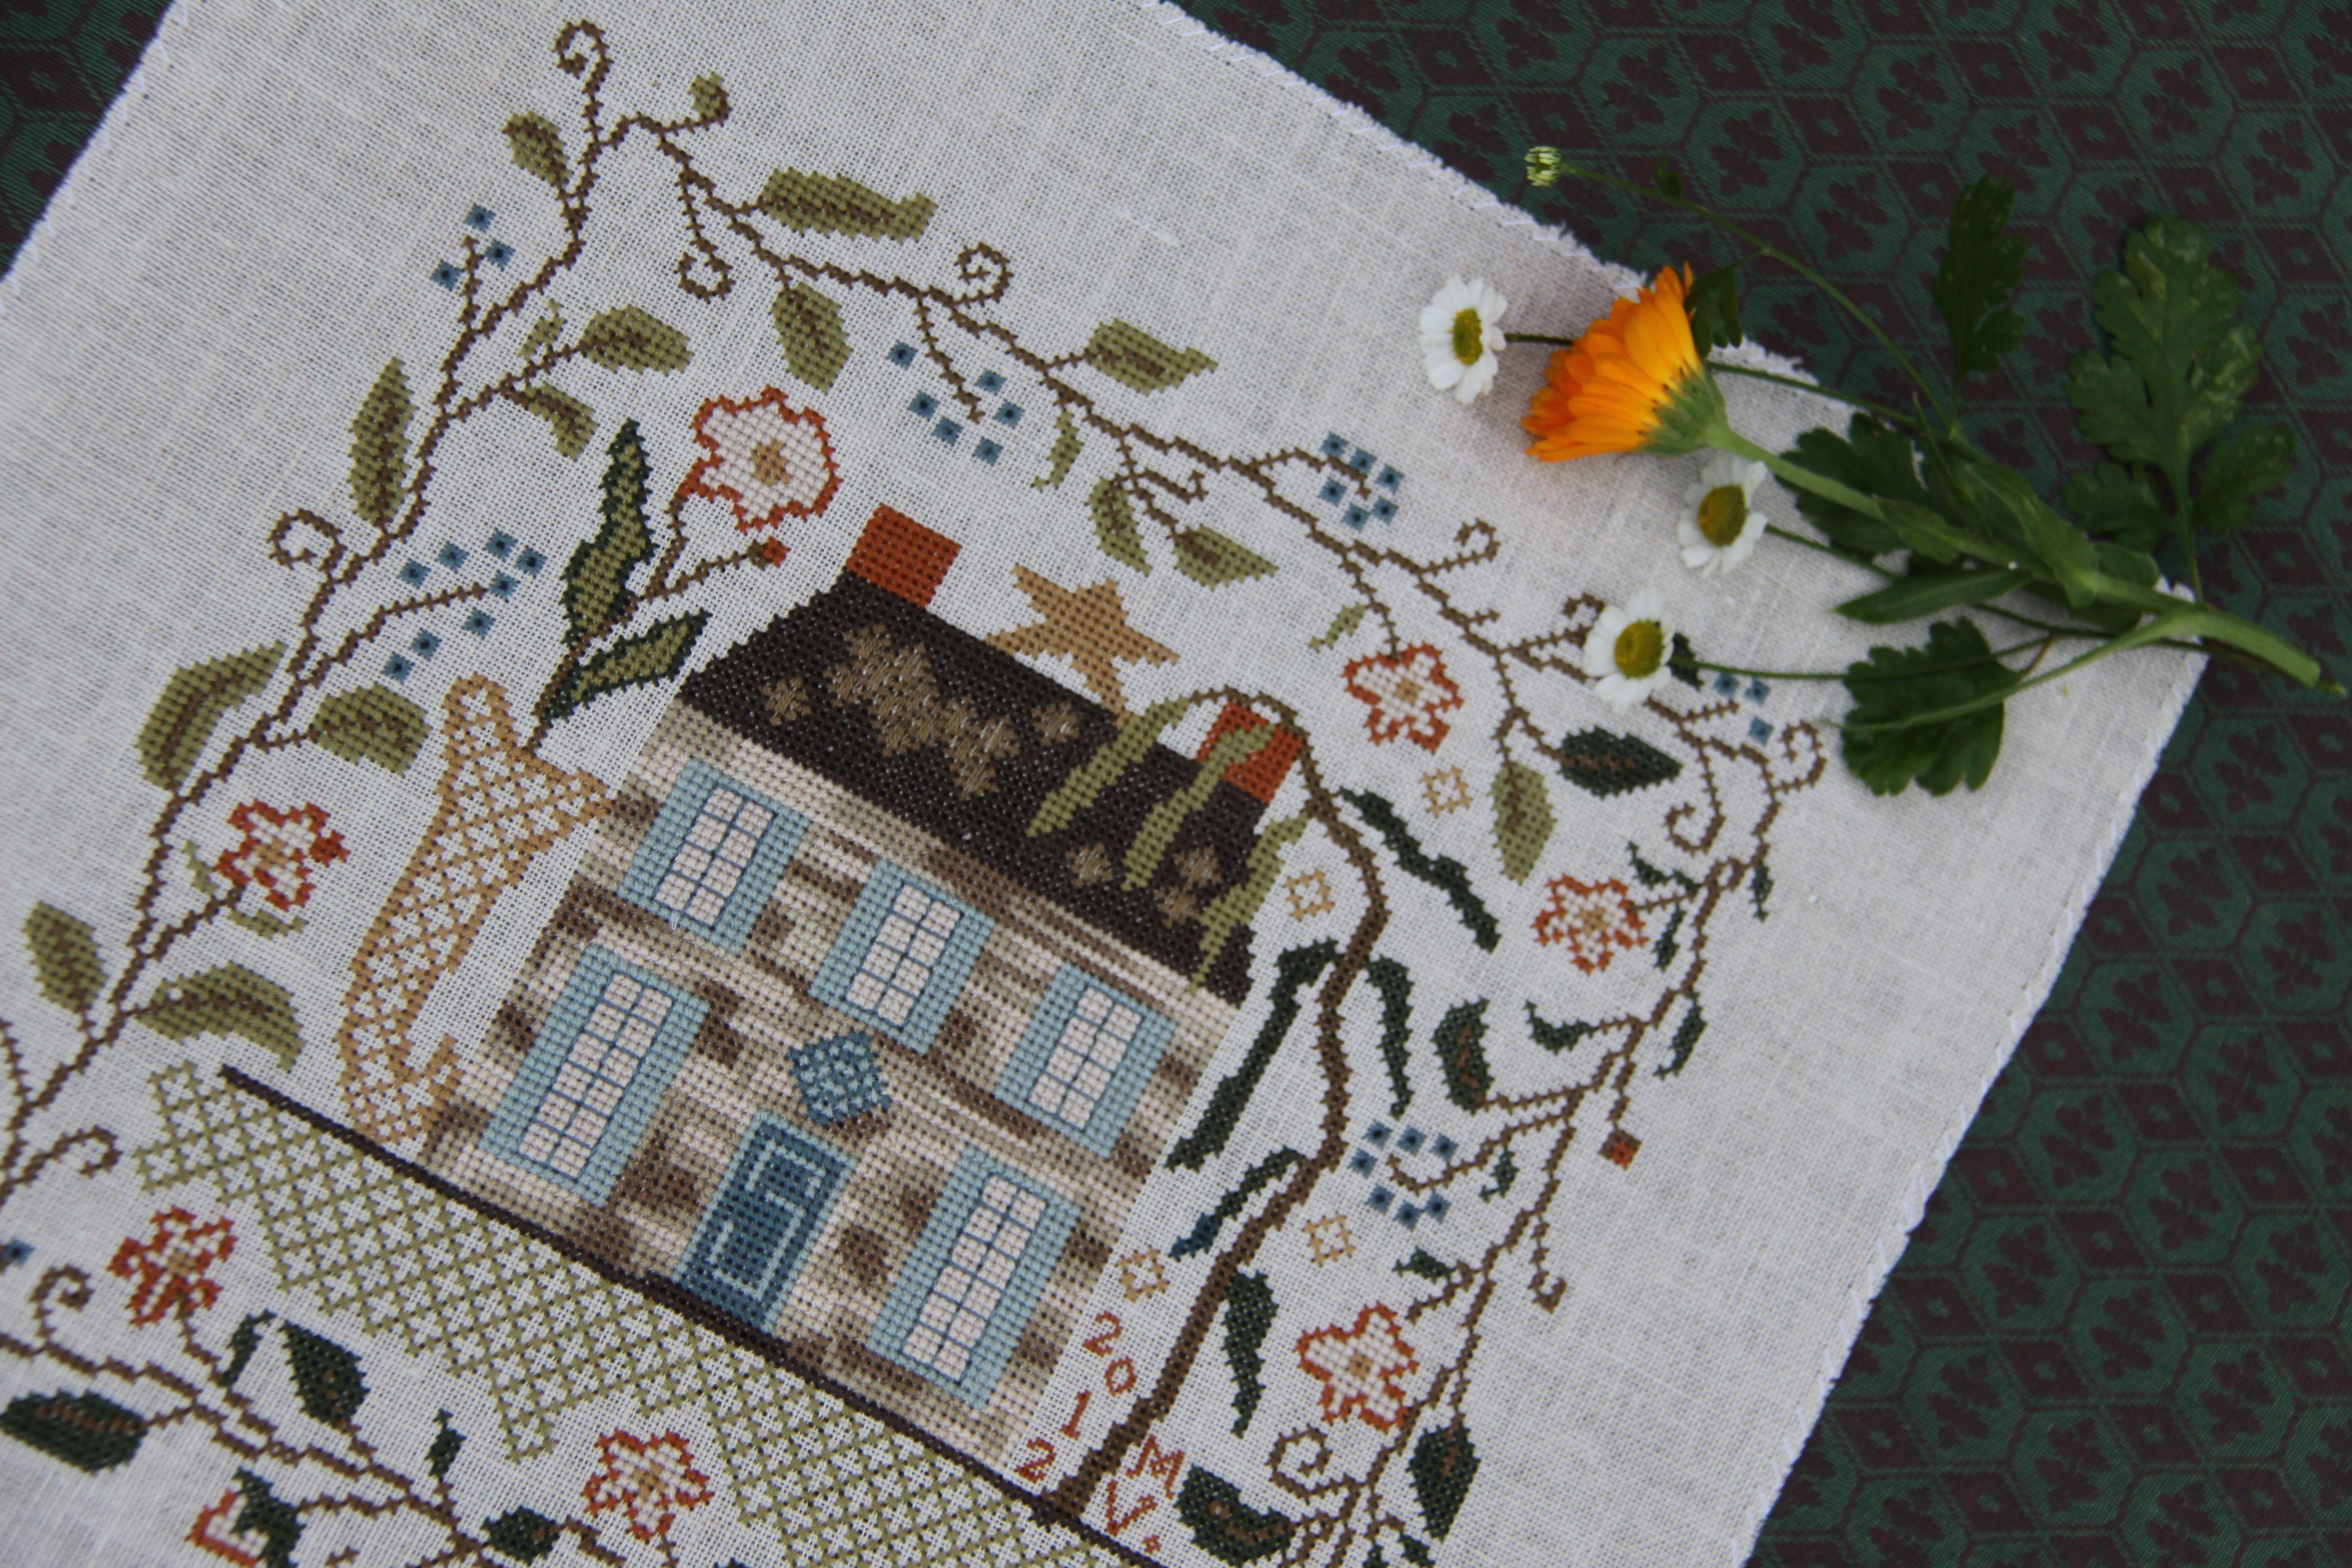 Pin by carol funicelli on cross stitch pinterest for Blackbird designs english garden